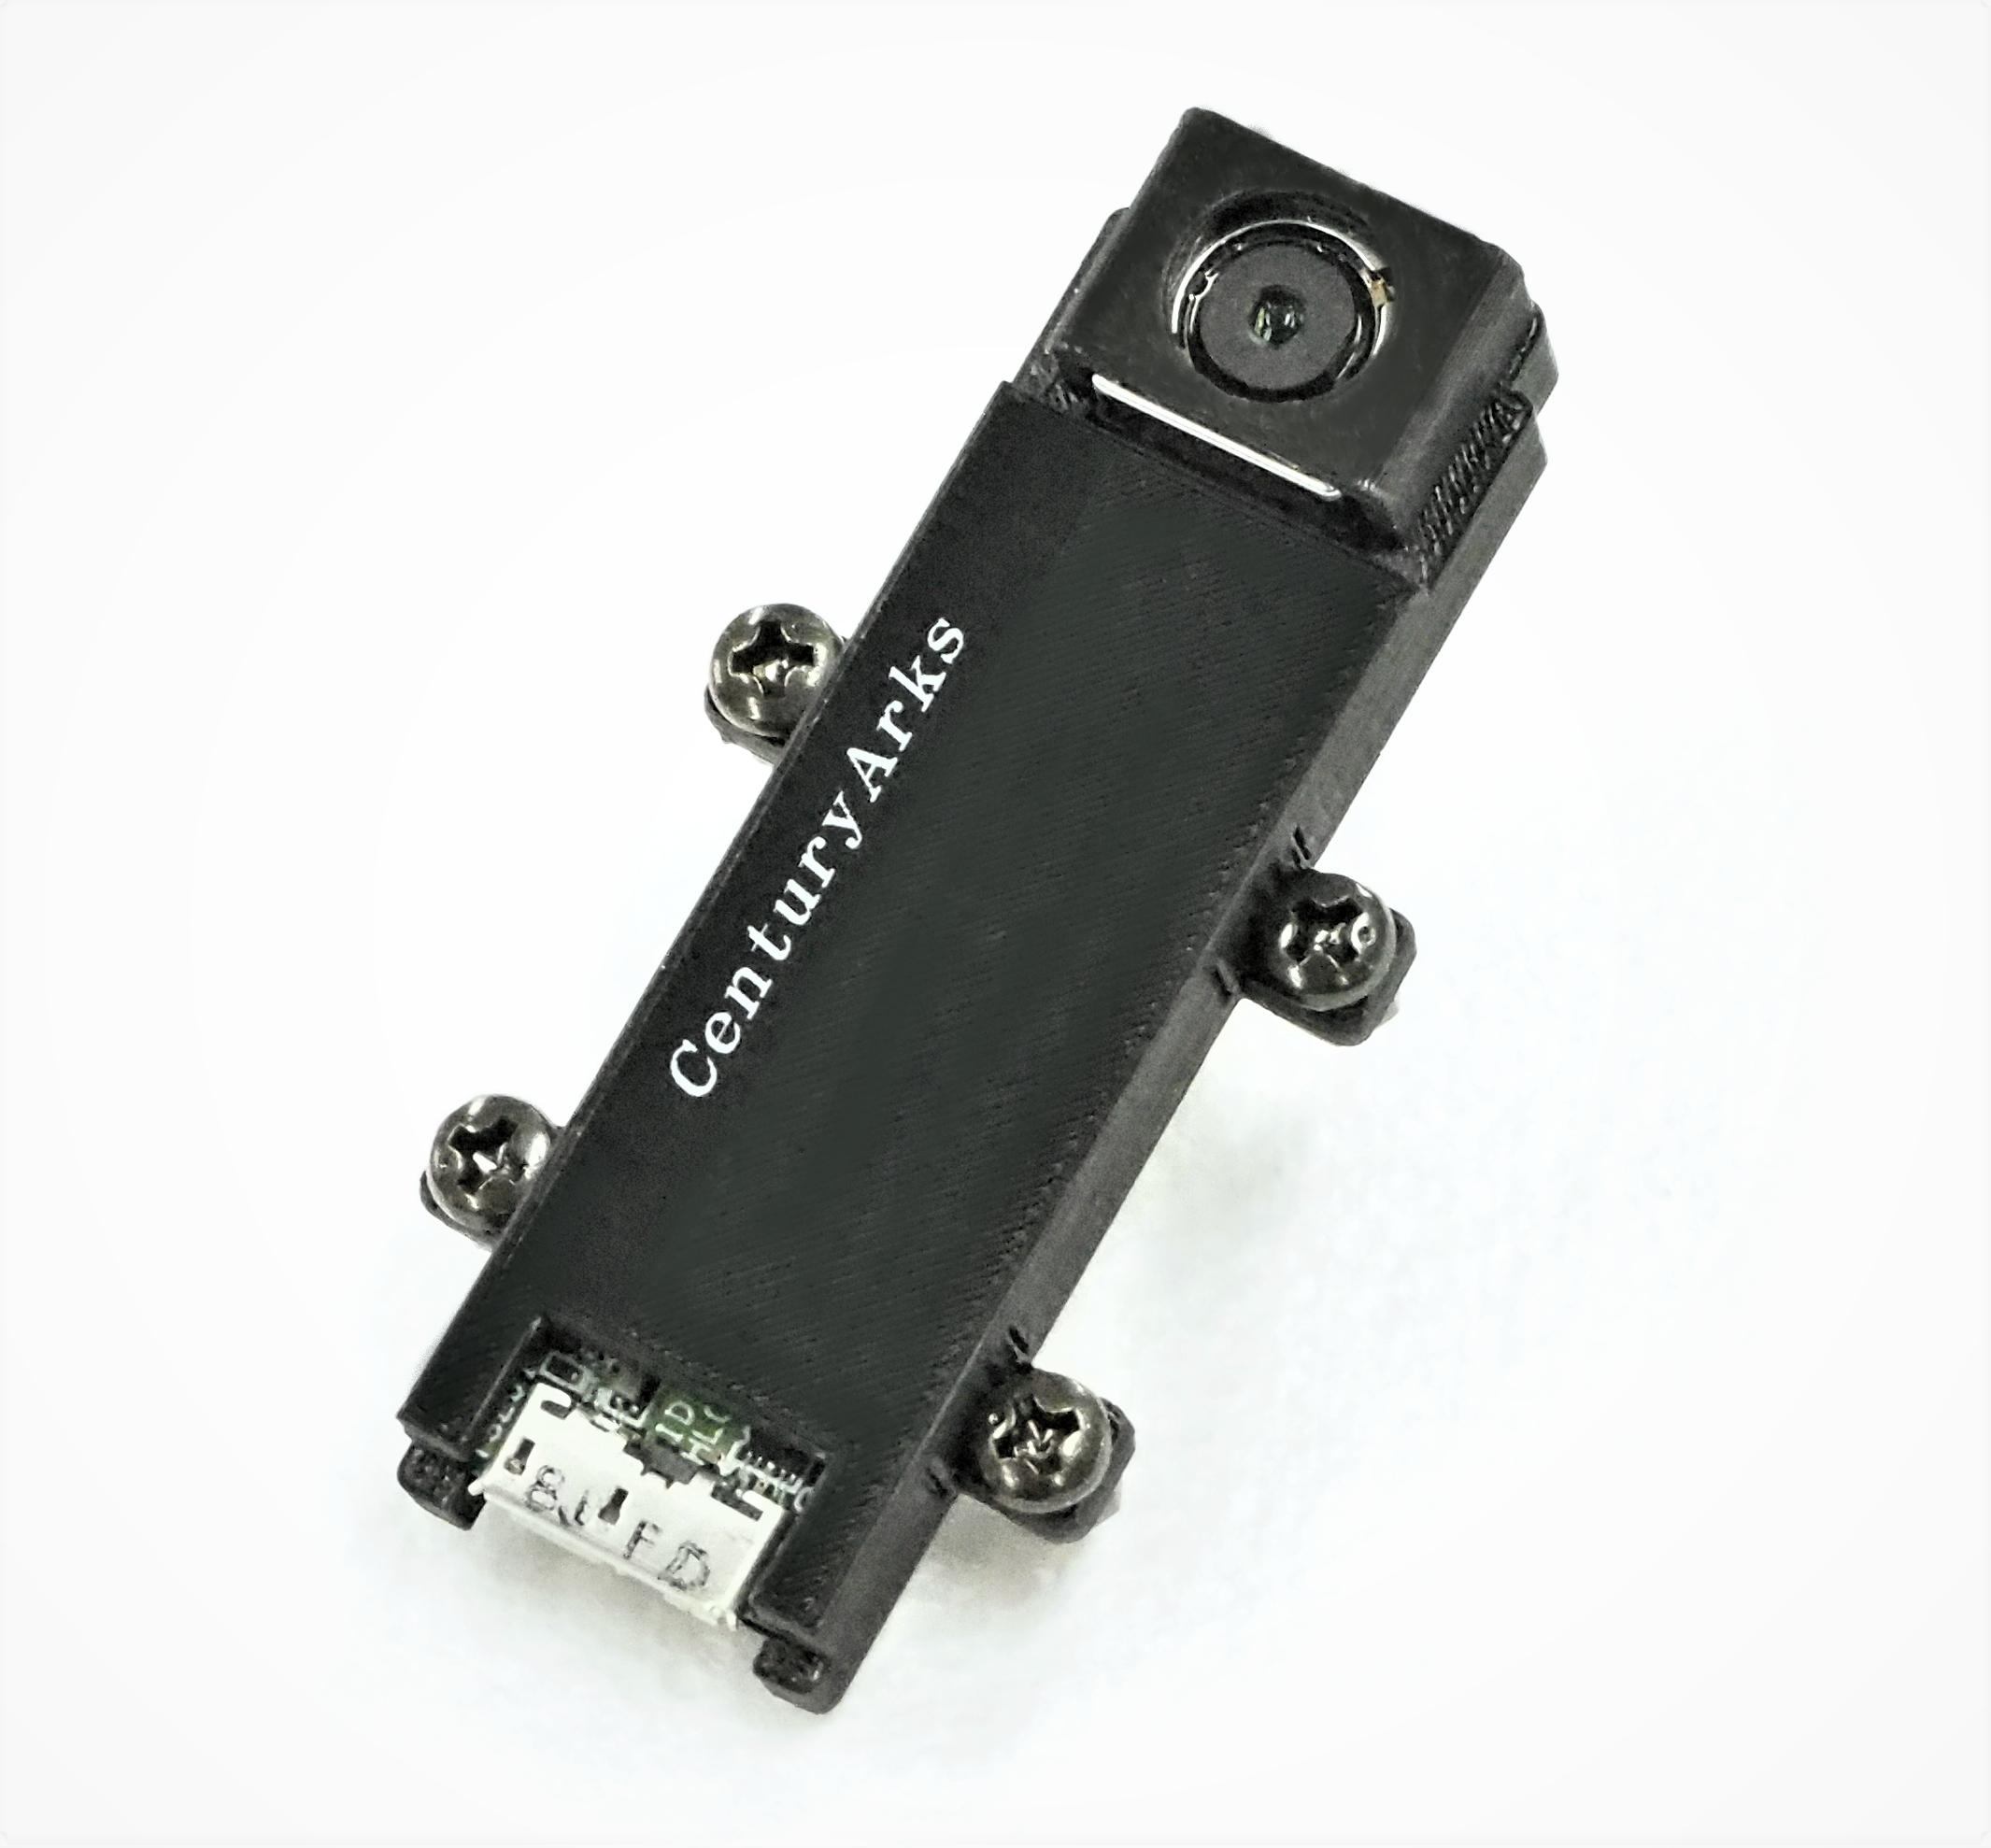 USB Camera - CenturyArks